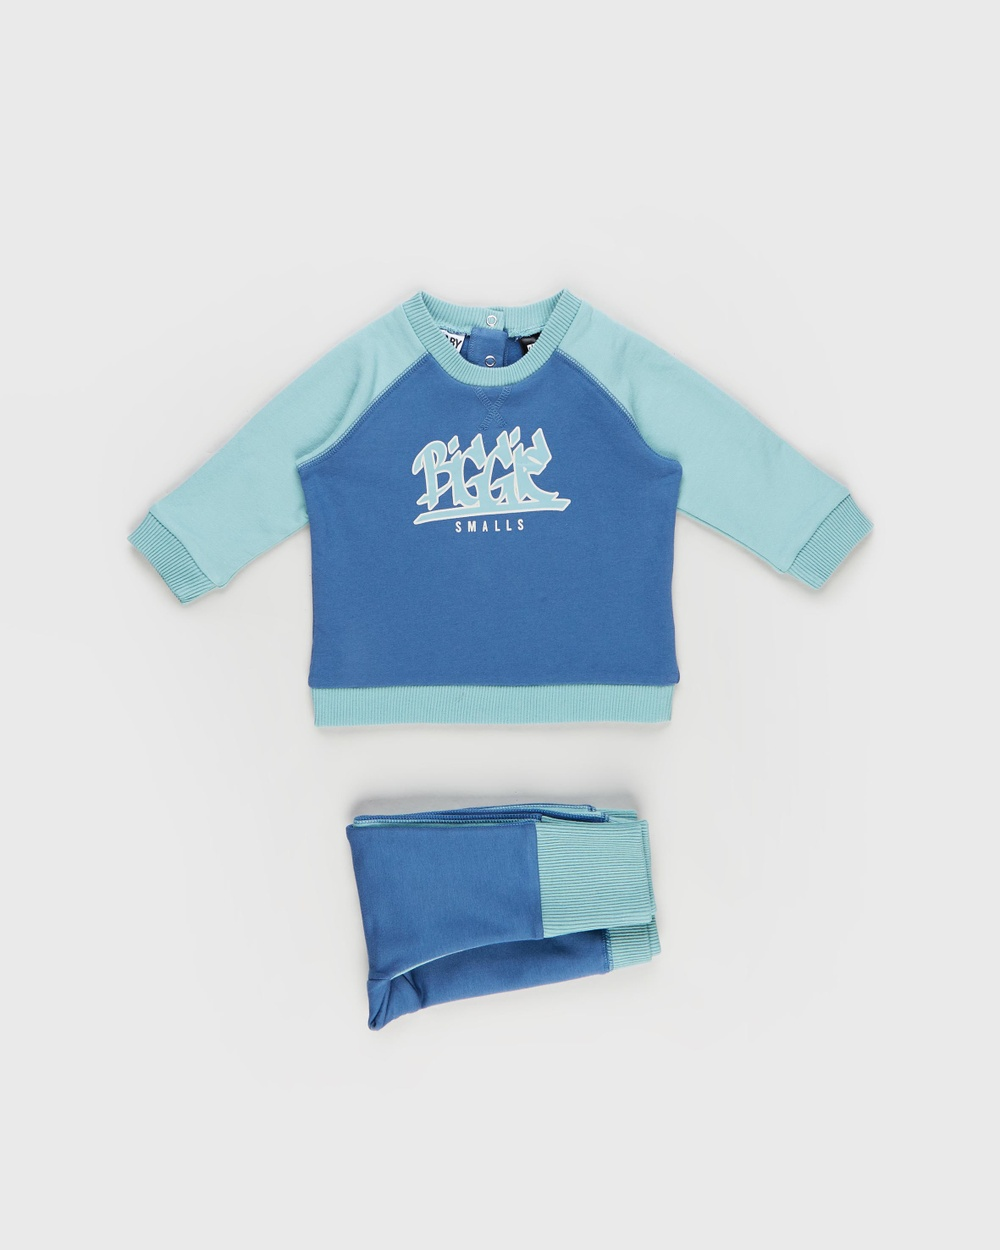 Cotton On Baby Tate Sully Tracksuit Babies Sweats Licensed Petty Blue & Biggie Graffiti Logo